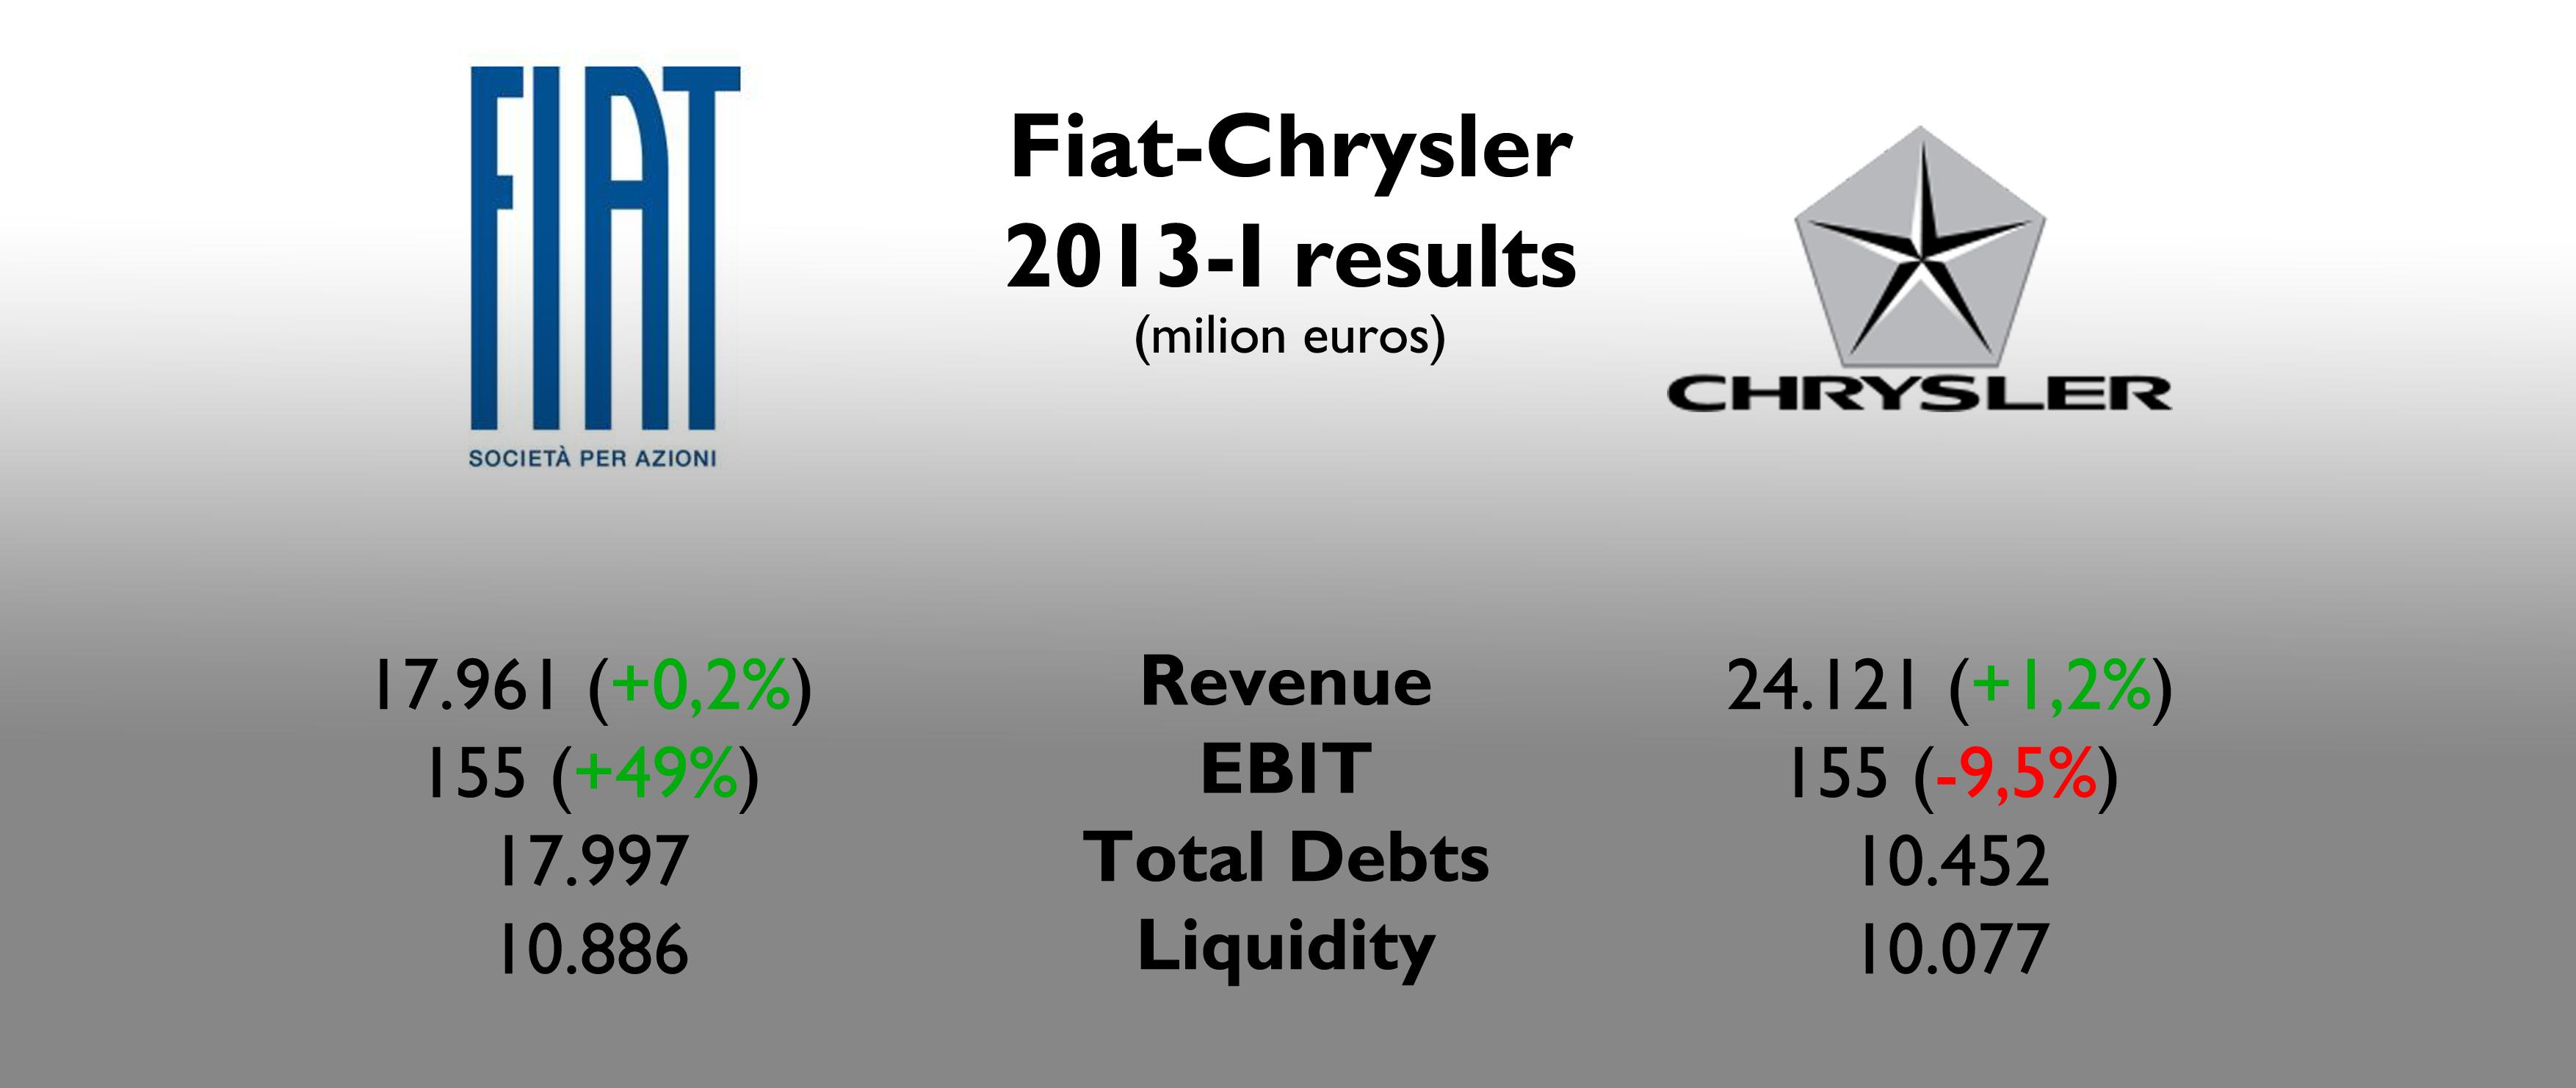 2013-H1: Fiat-Chrysler Sells 2,18M Units And Profits Fall